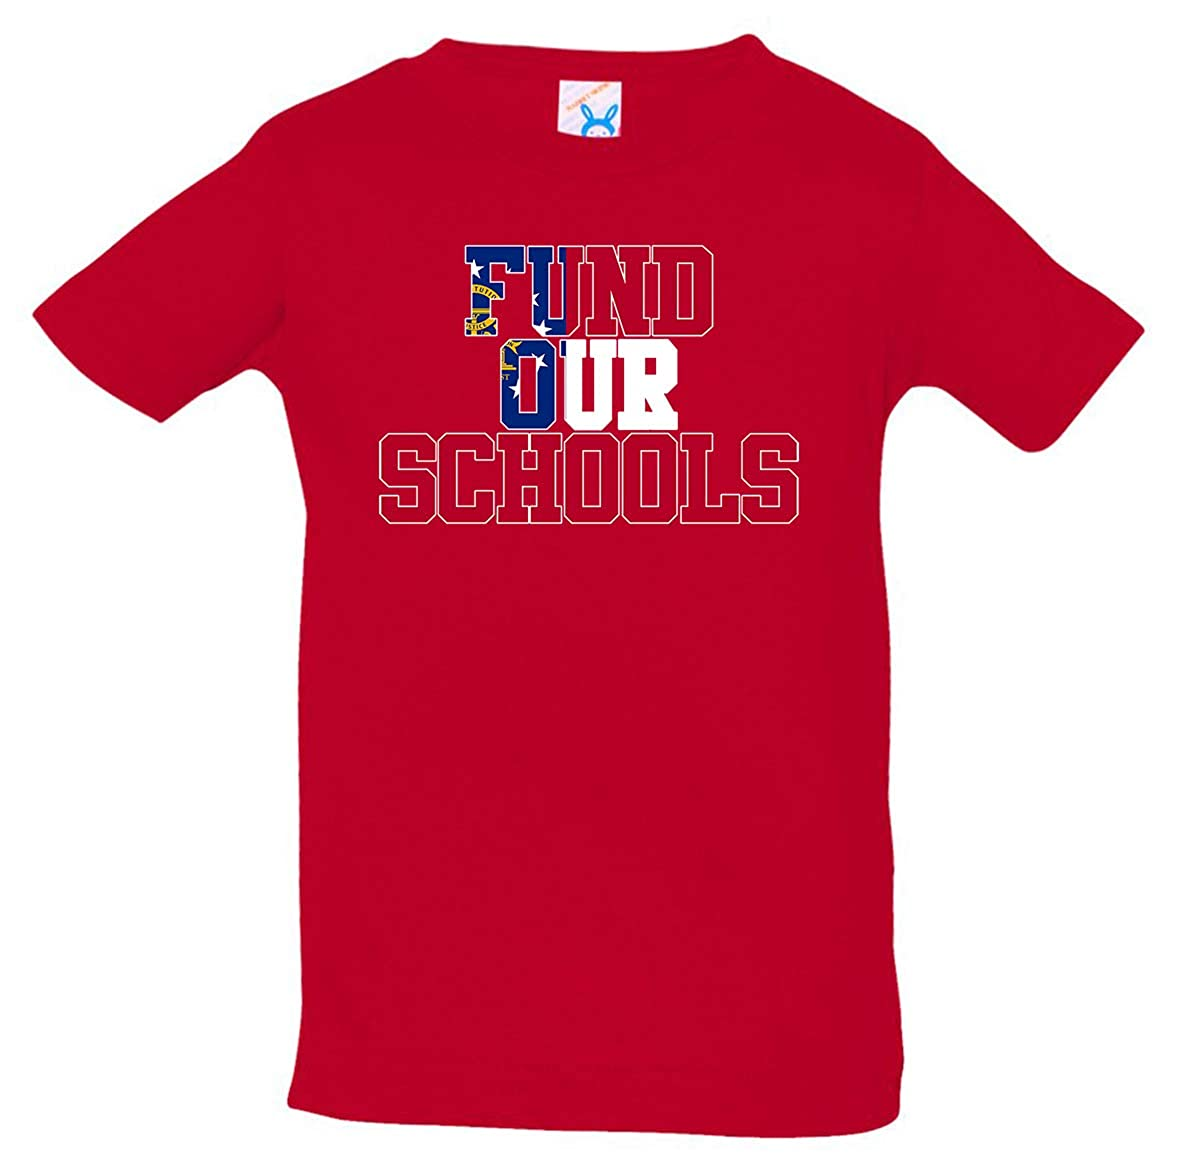 Tenacitee Babys Fund Our Georgia Schools Shirt